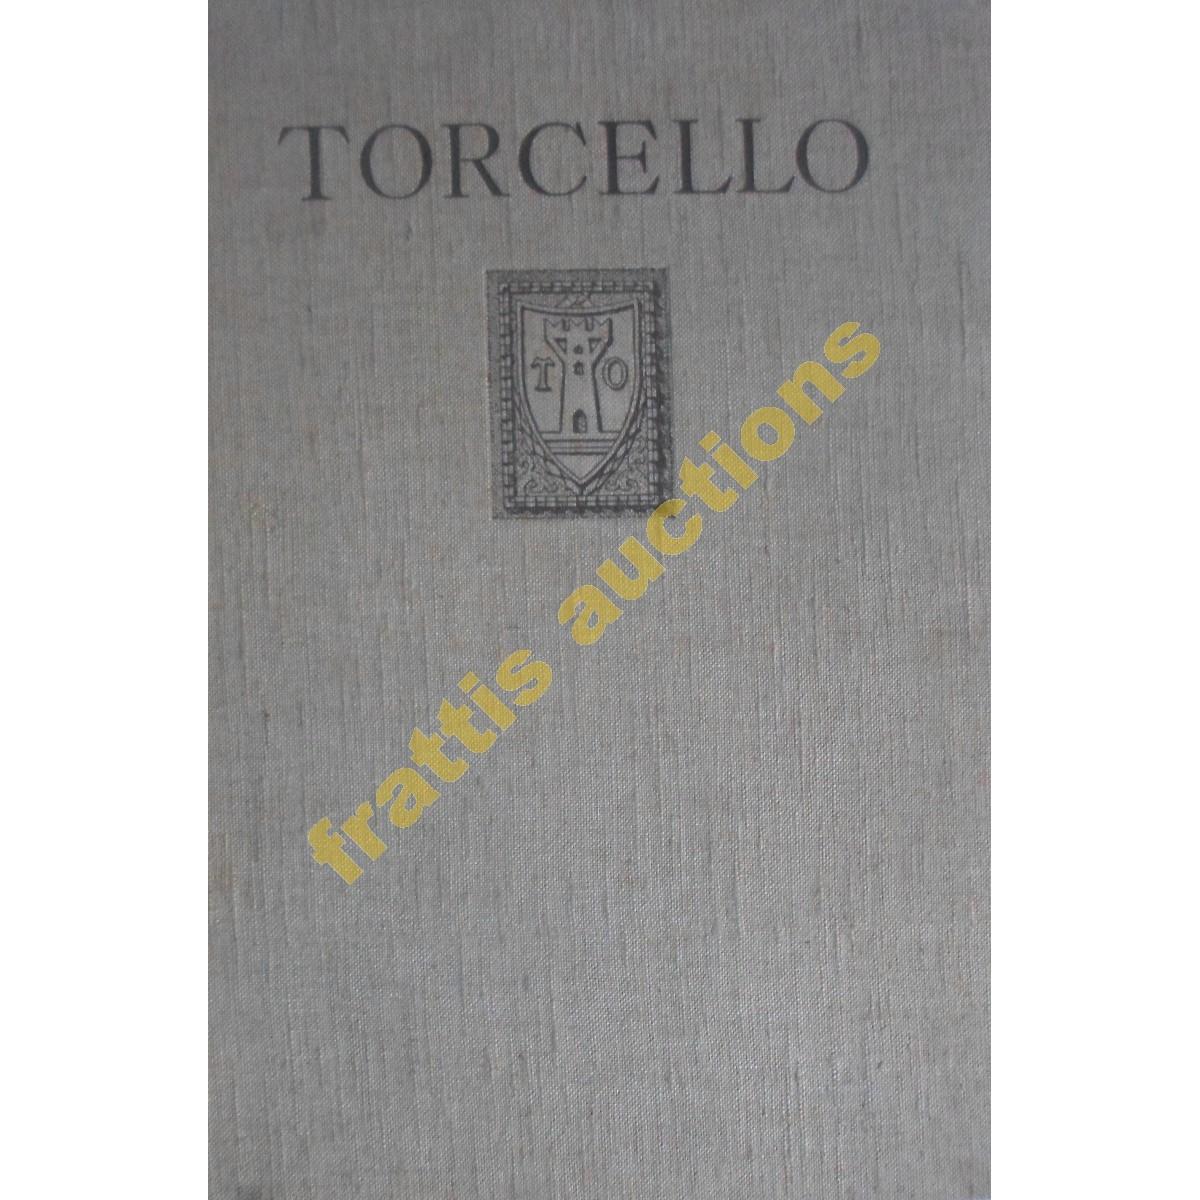 TORCELLO ITALY LATIN CHURCH ART PLATES FOLIO 1927